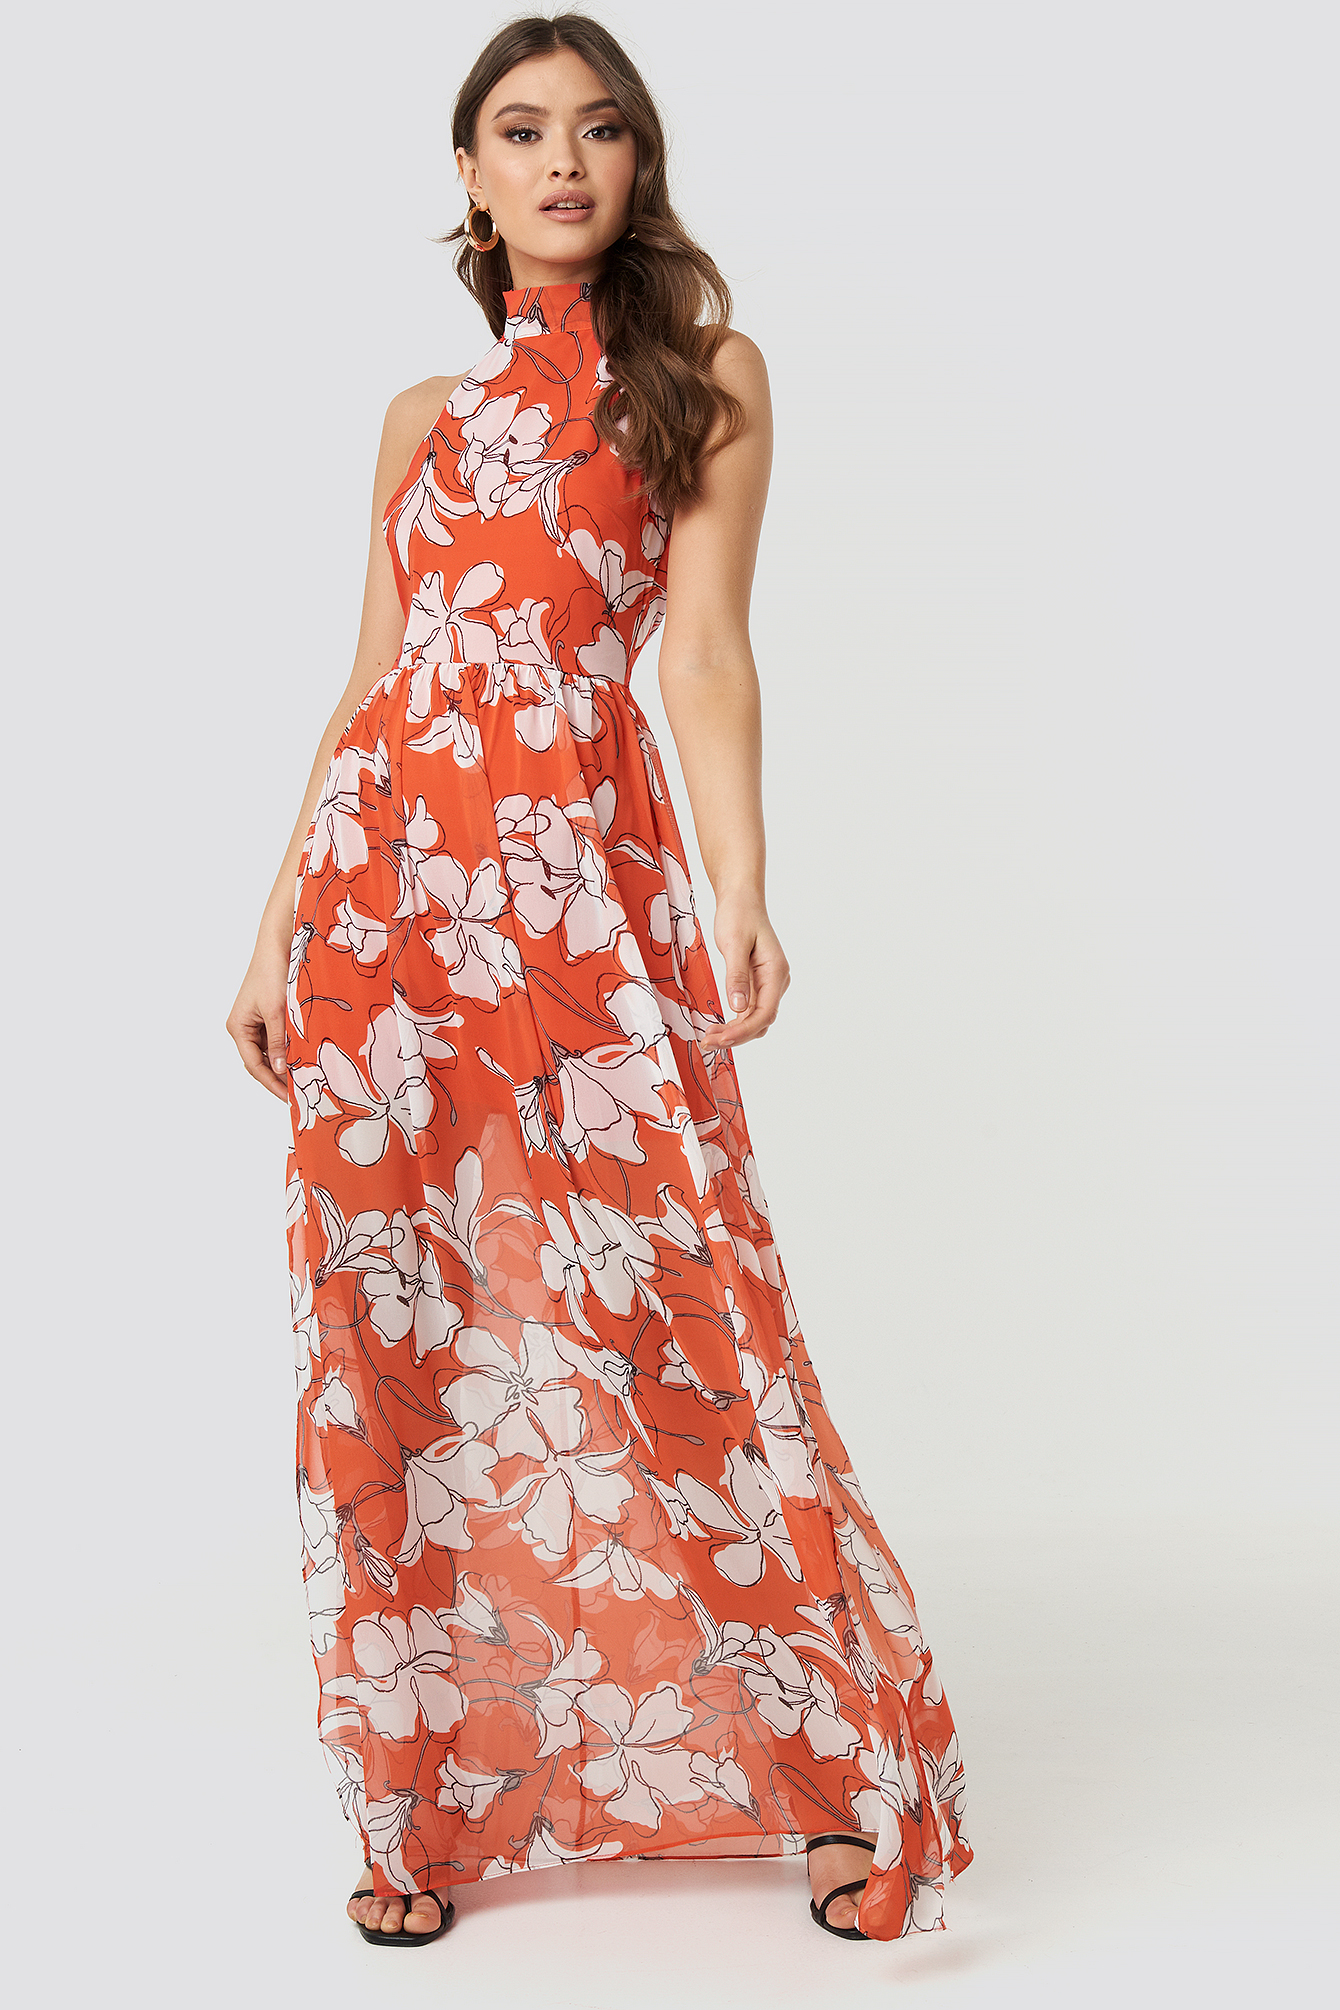 Flower Patterned Long Dress NA-KD.COM